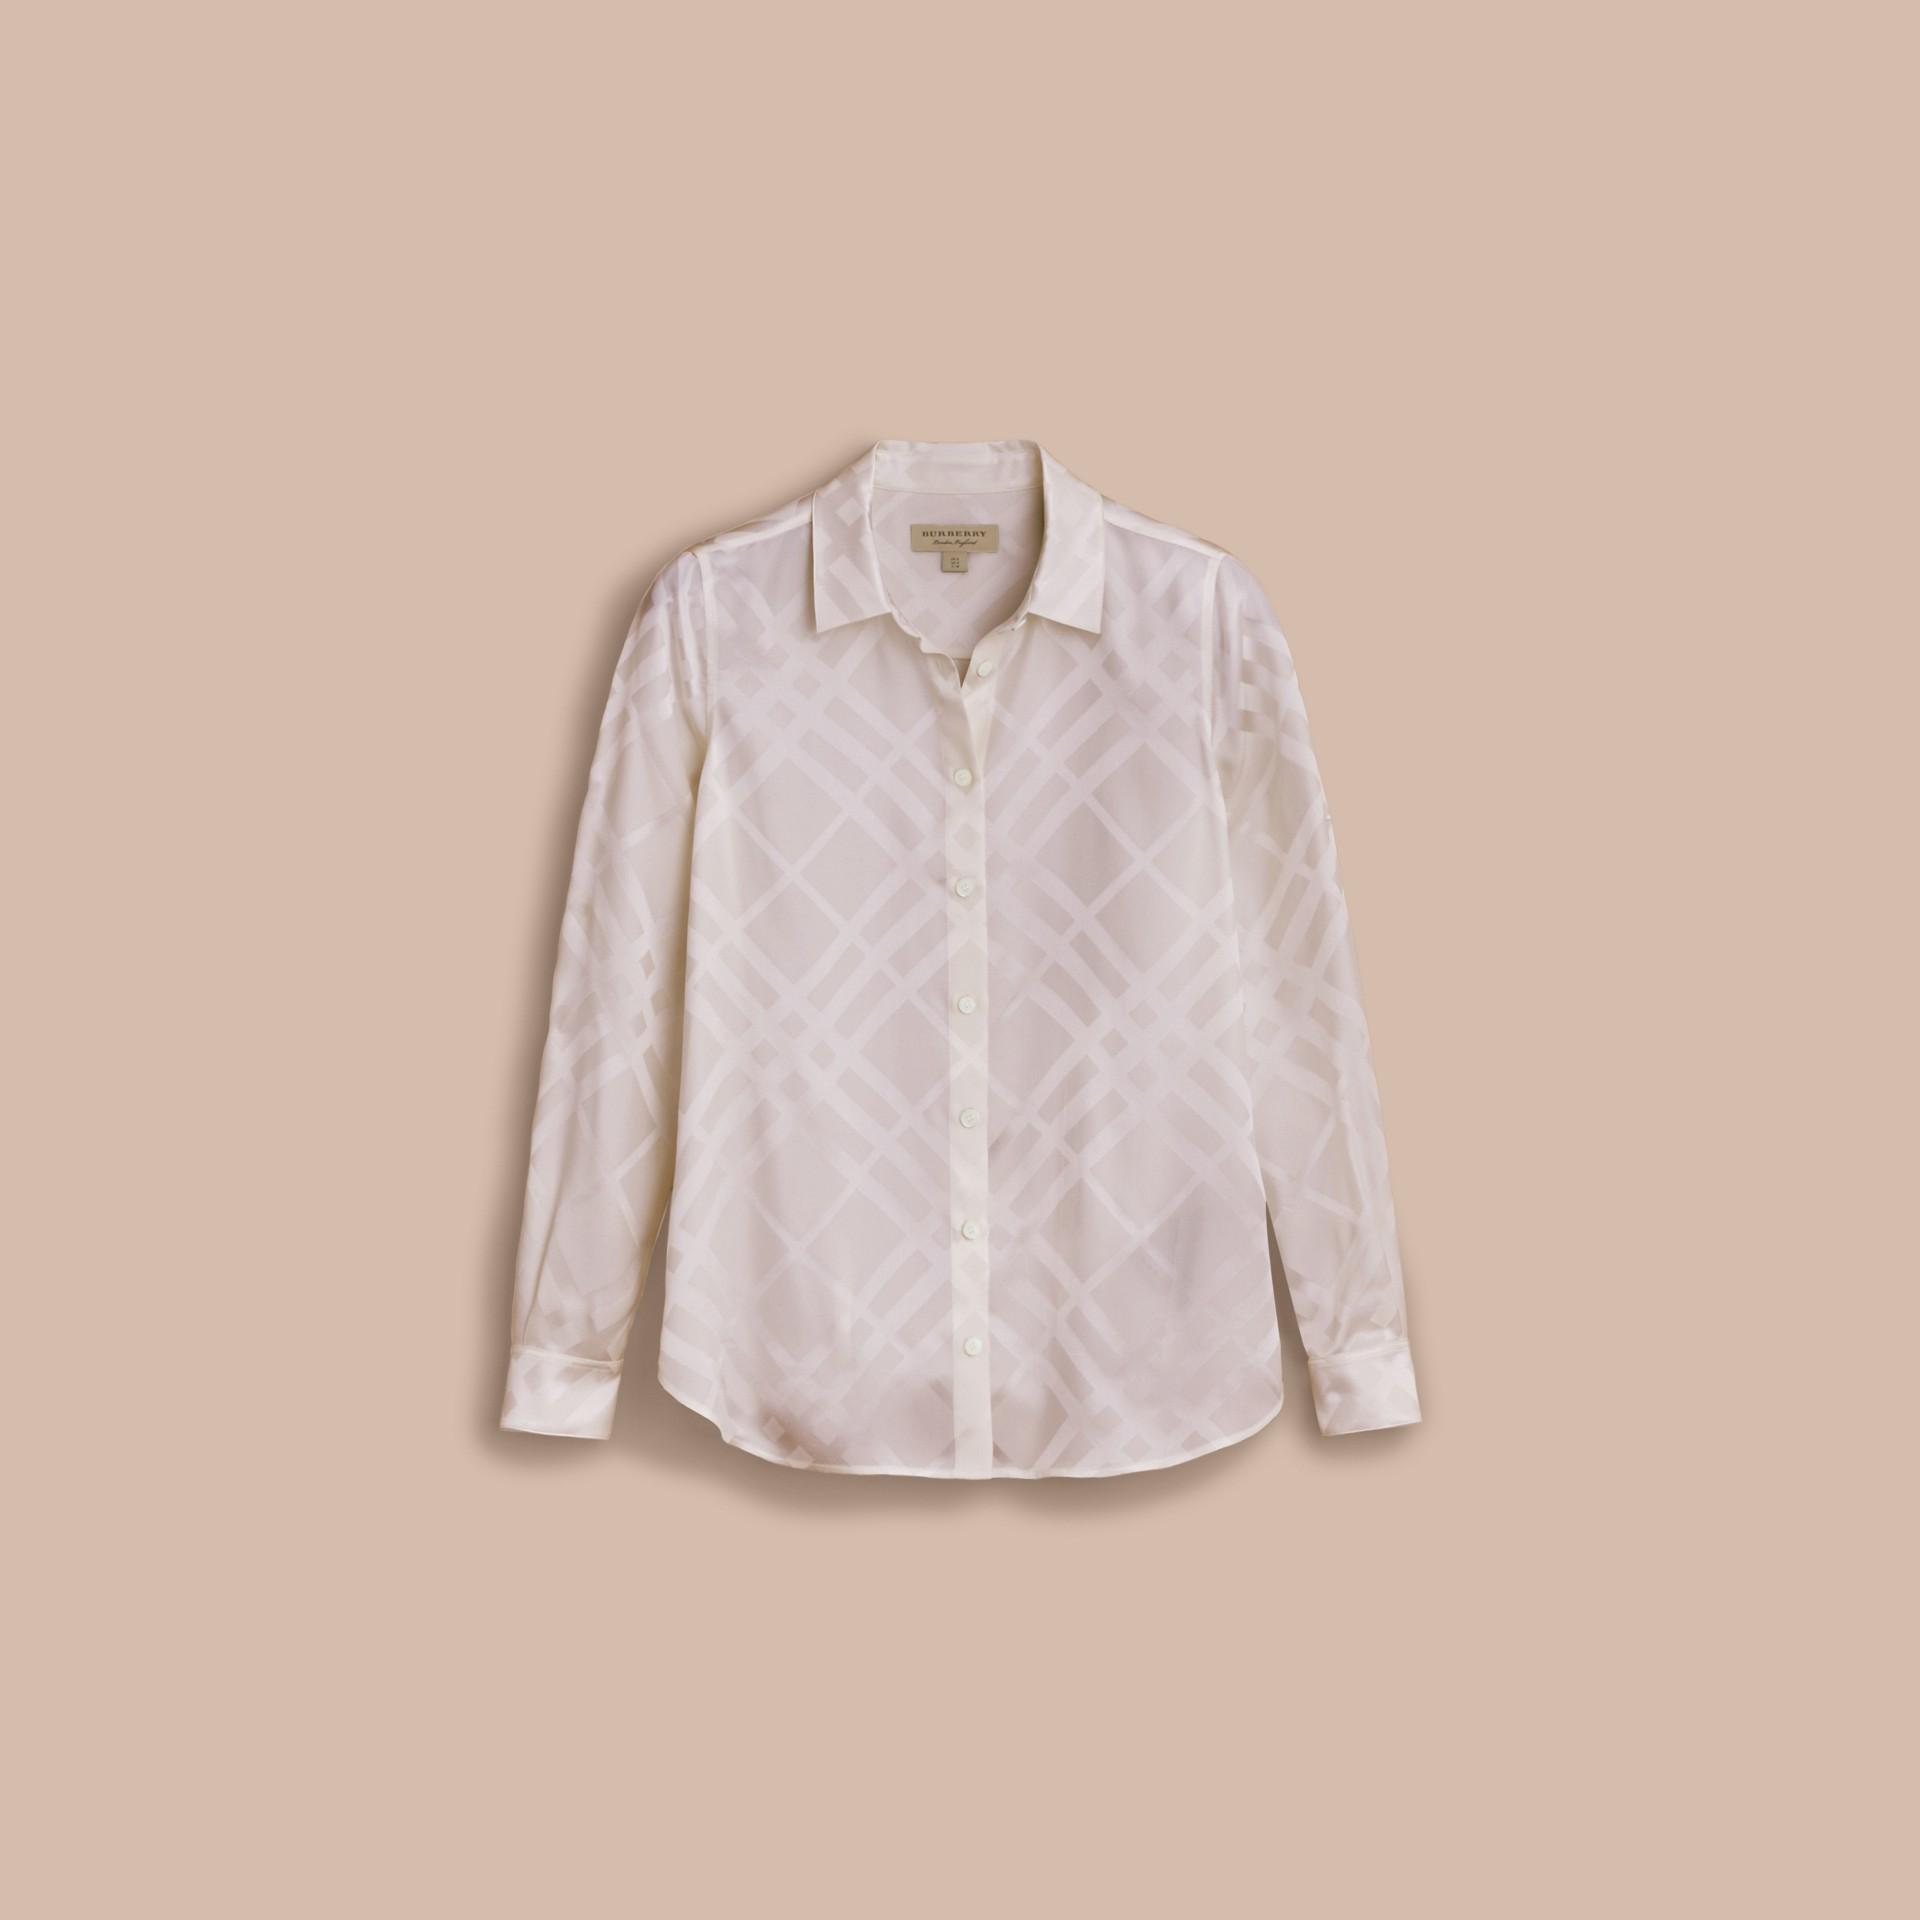 Tonal Check Silk Shirt in White - Women | Burberry Canada - gallery image 4